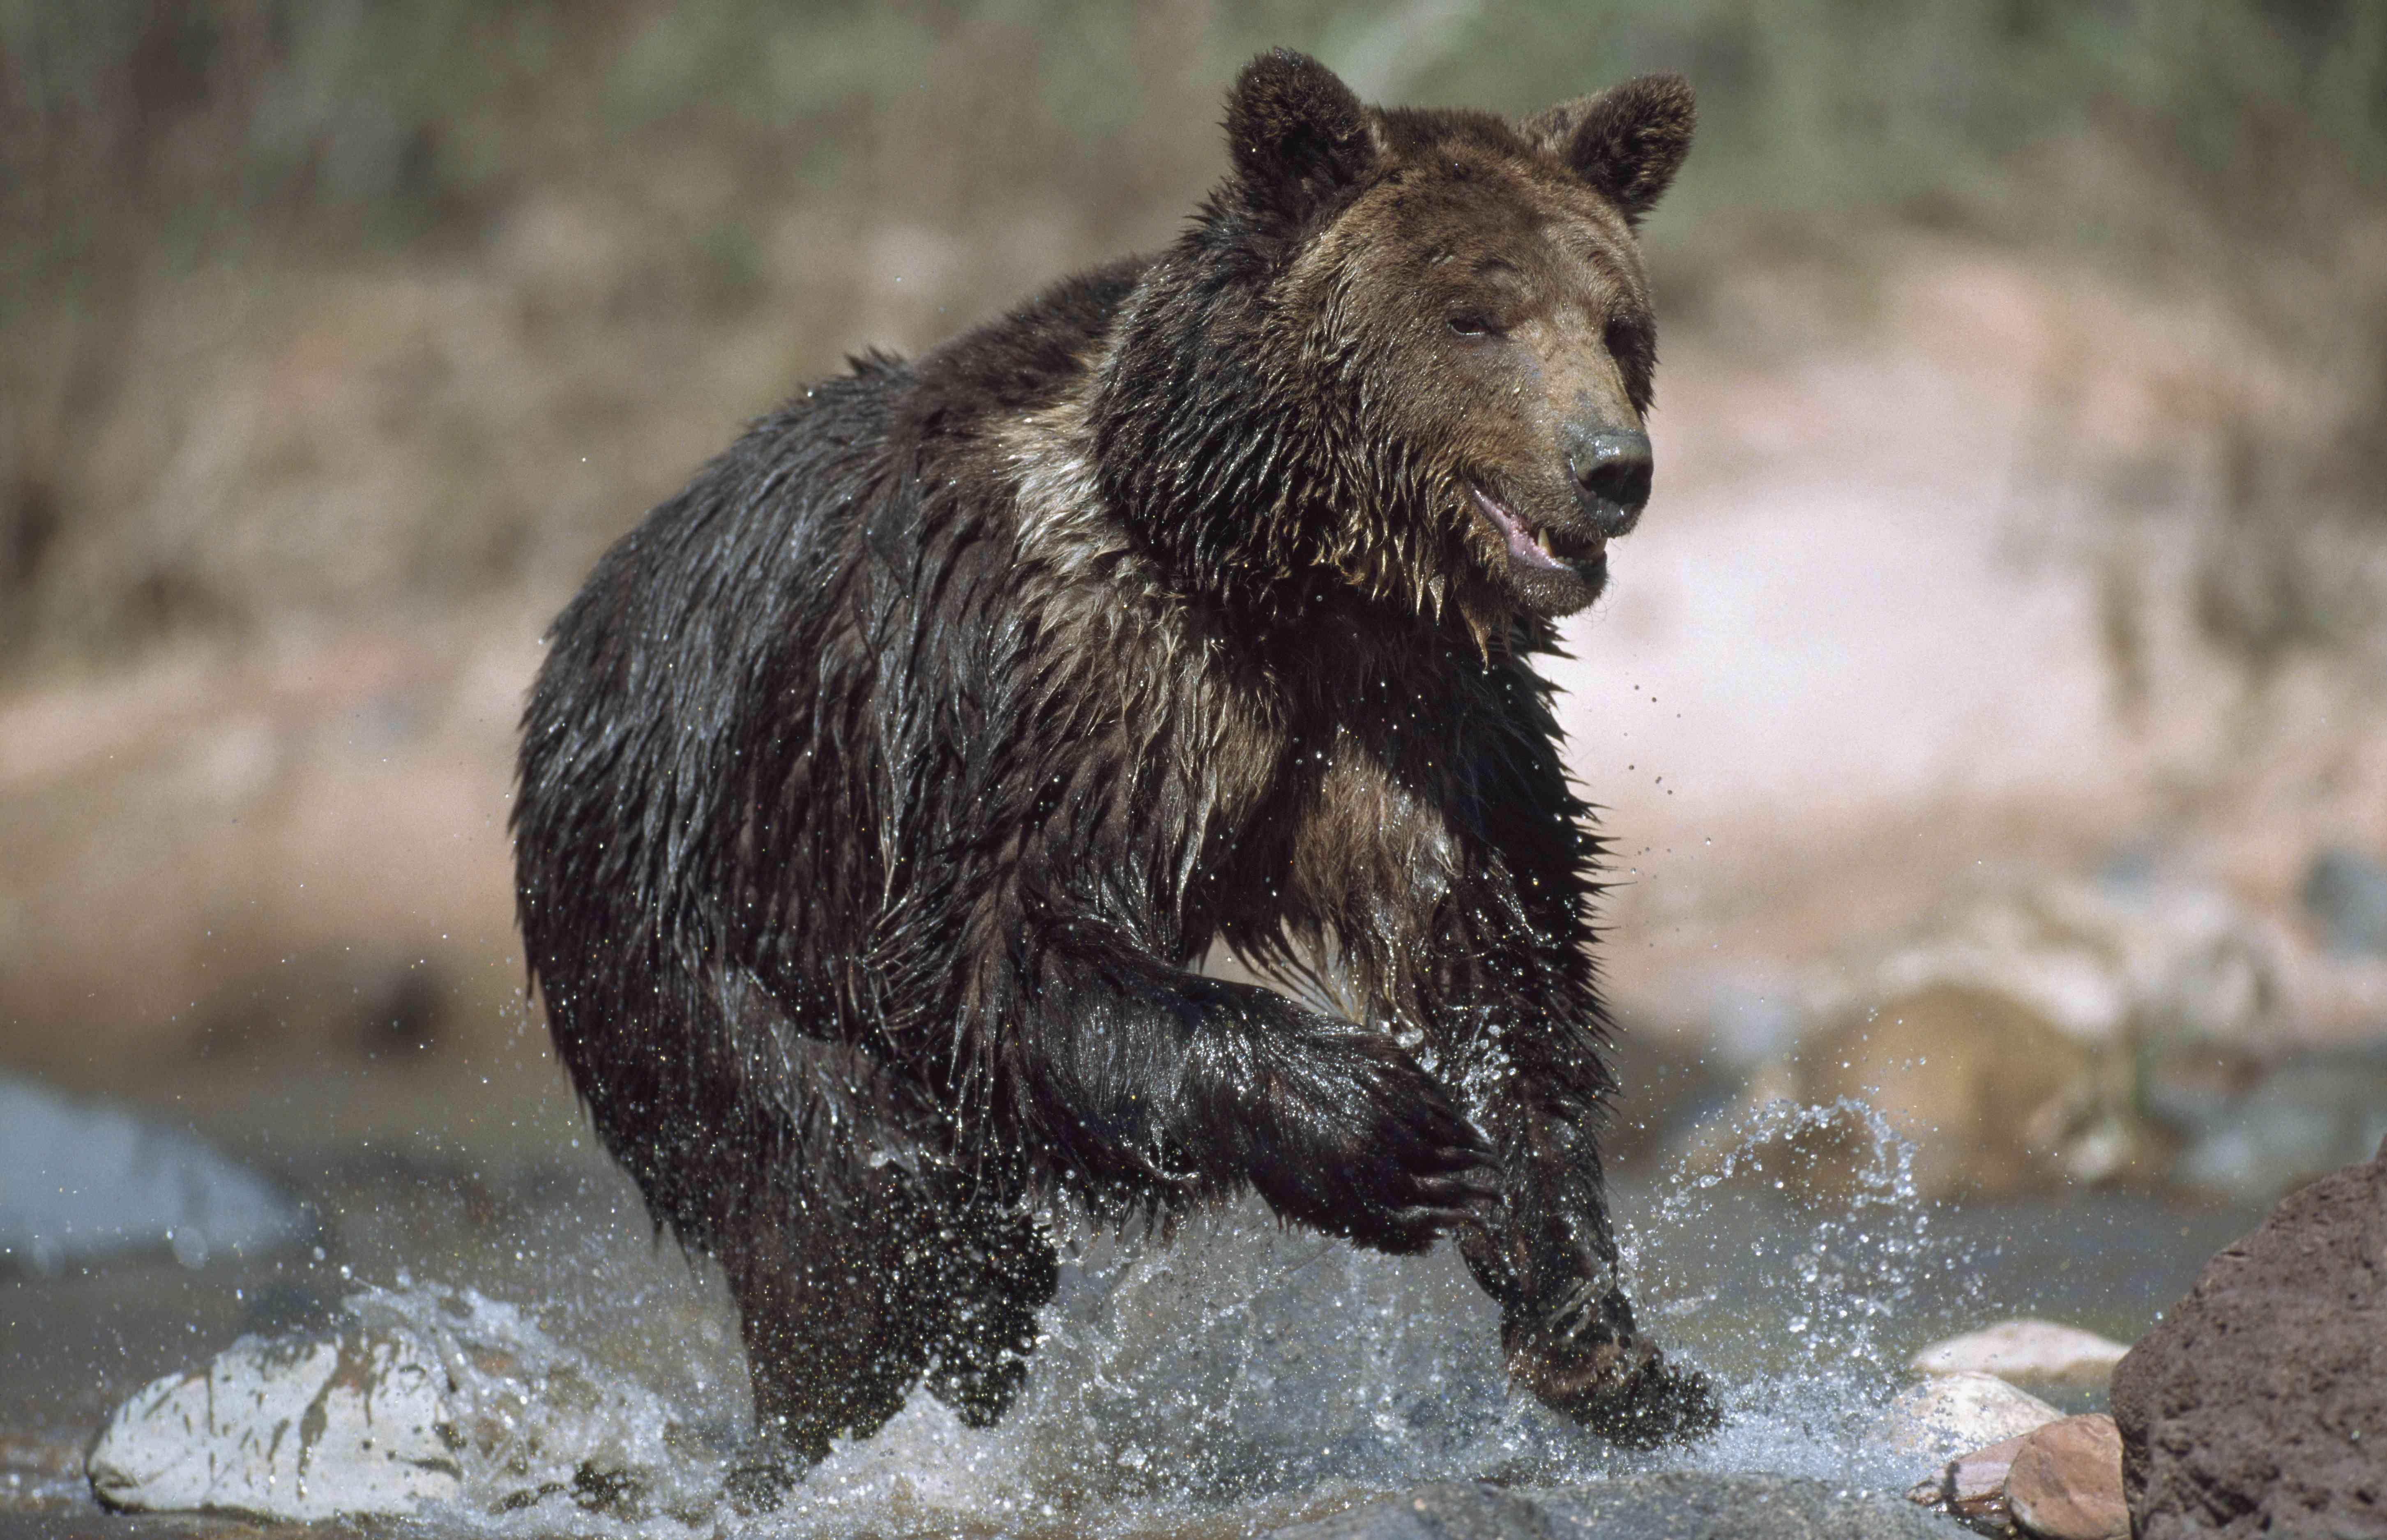 A grizzly bear runs through a river.